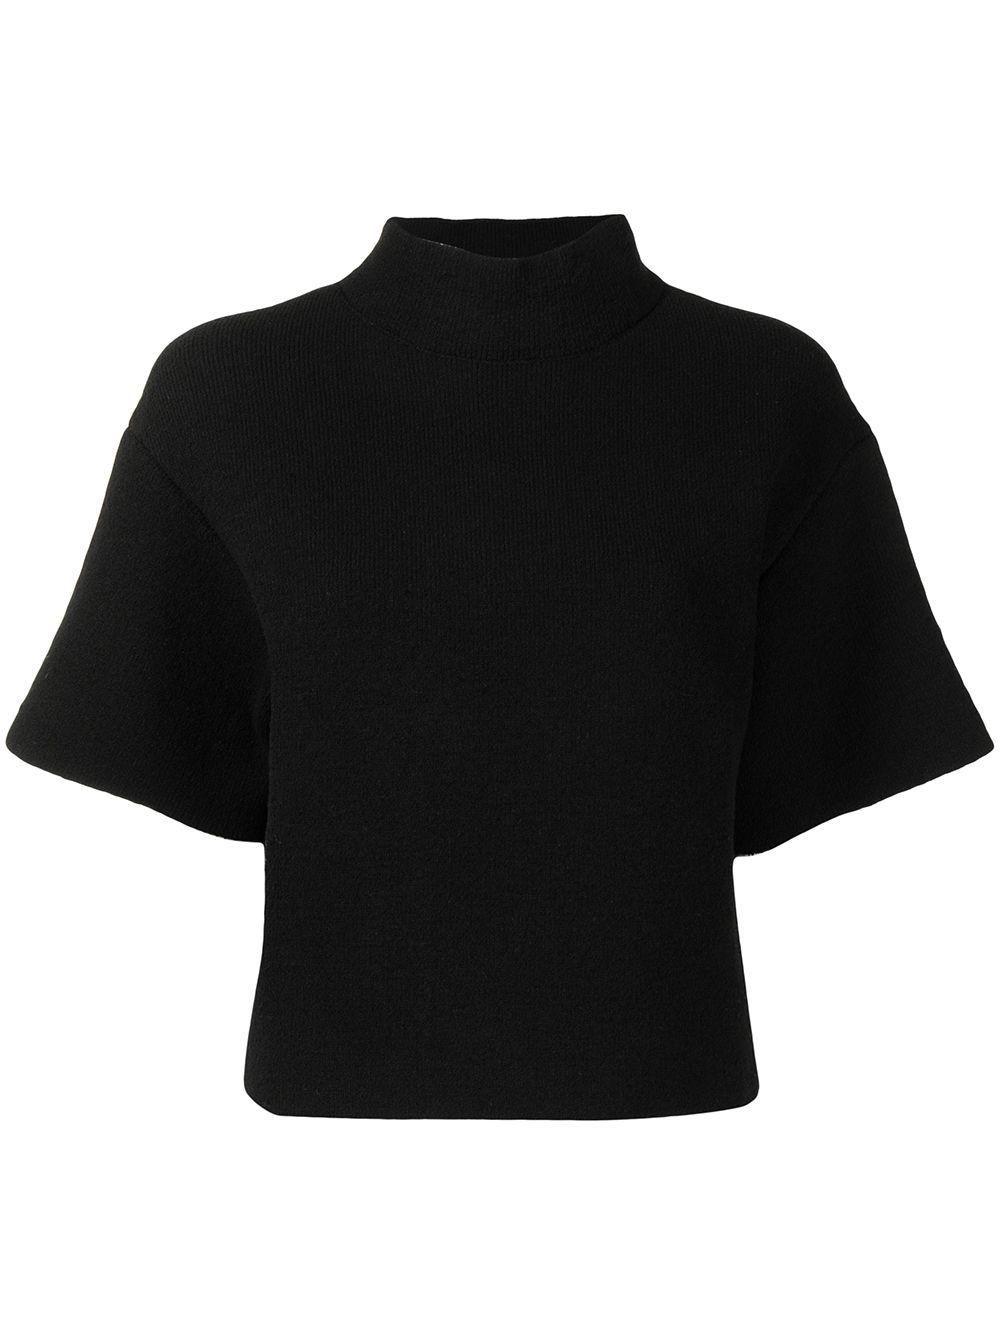 proenza schouler mock neck knitted top